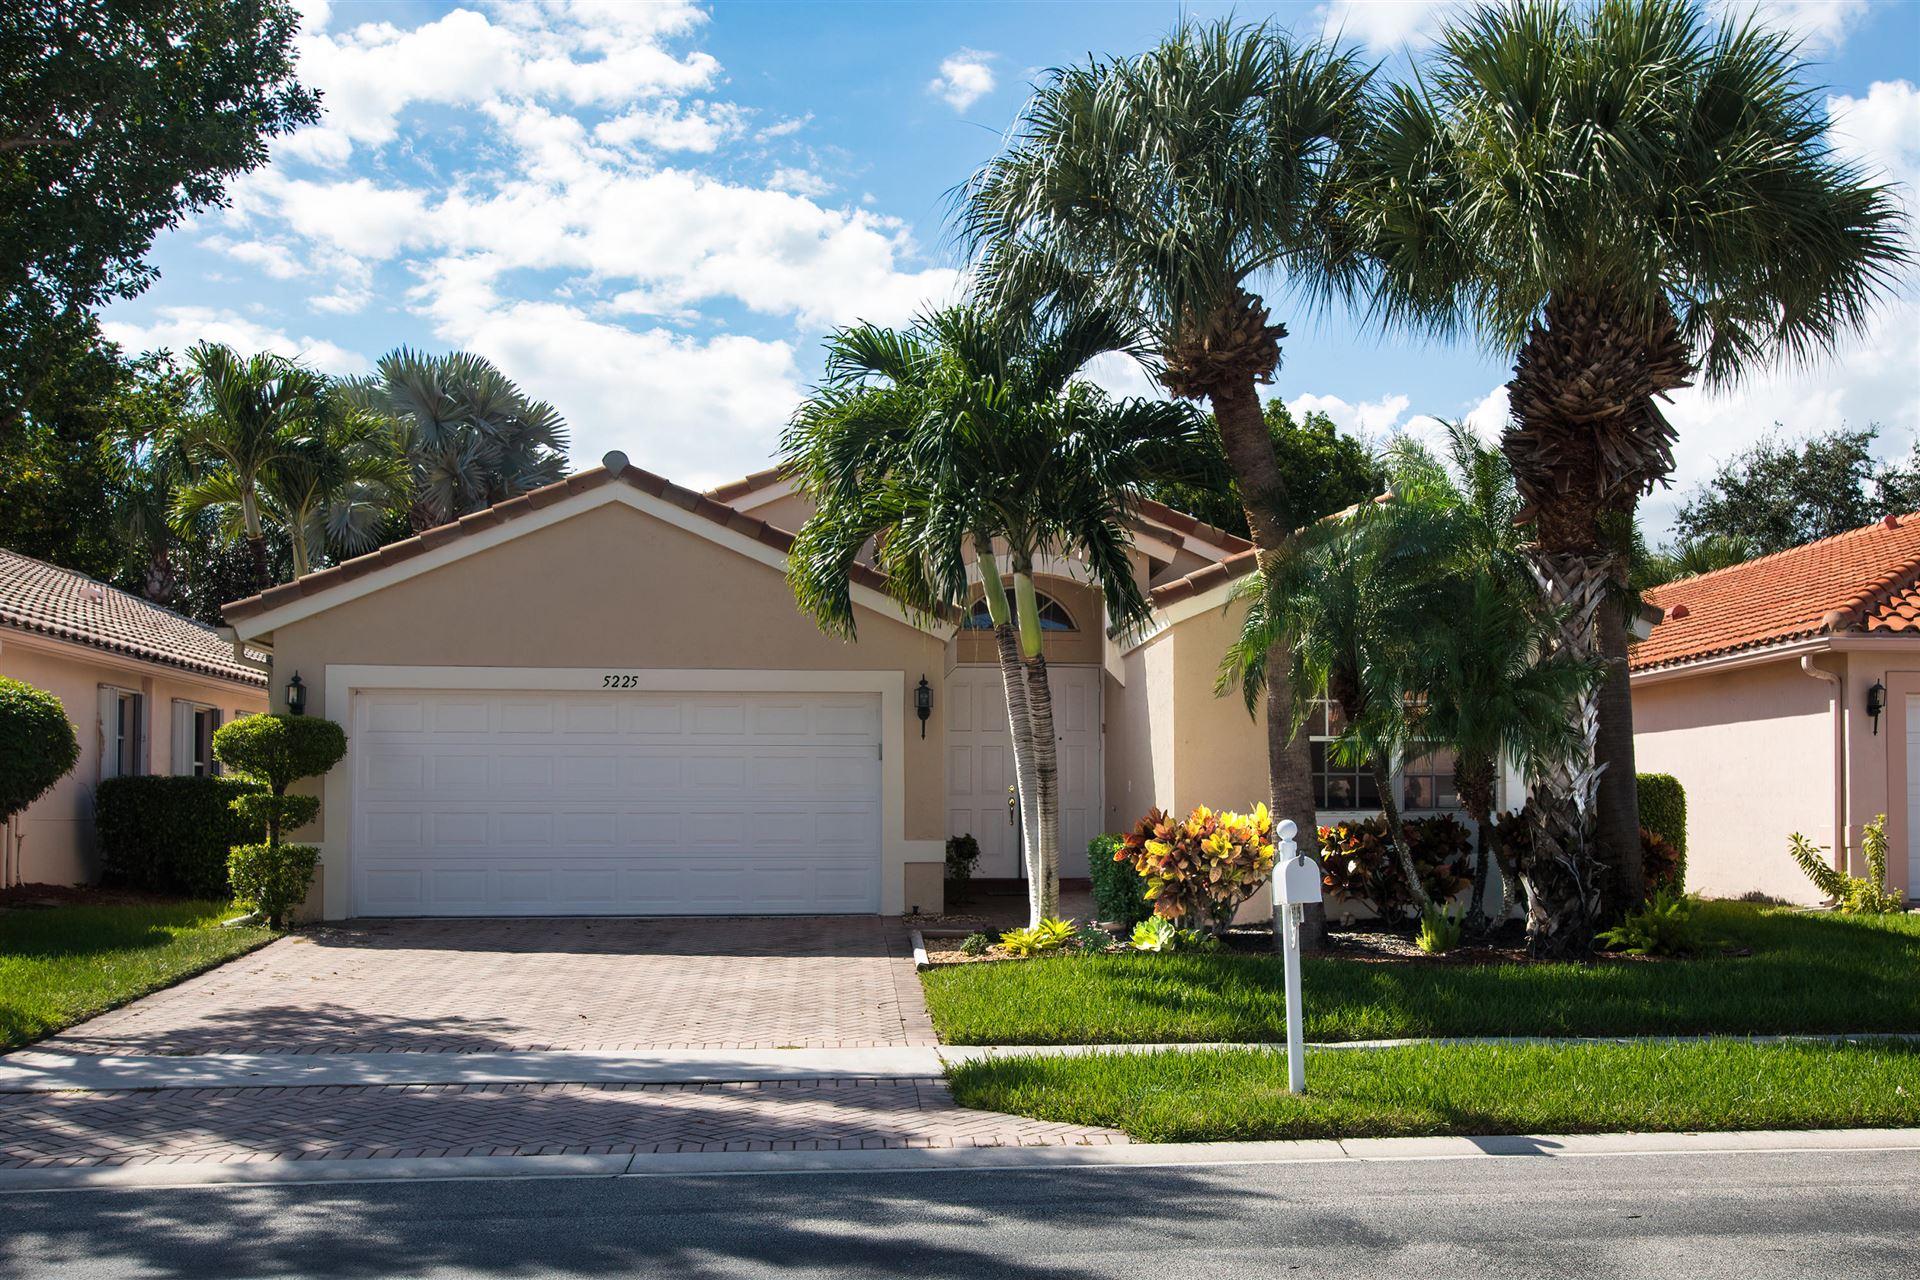 5225 Glenville Drive, Boynton Beach, FL 33437 - #: RX-10662773